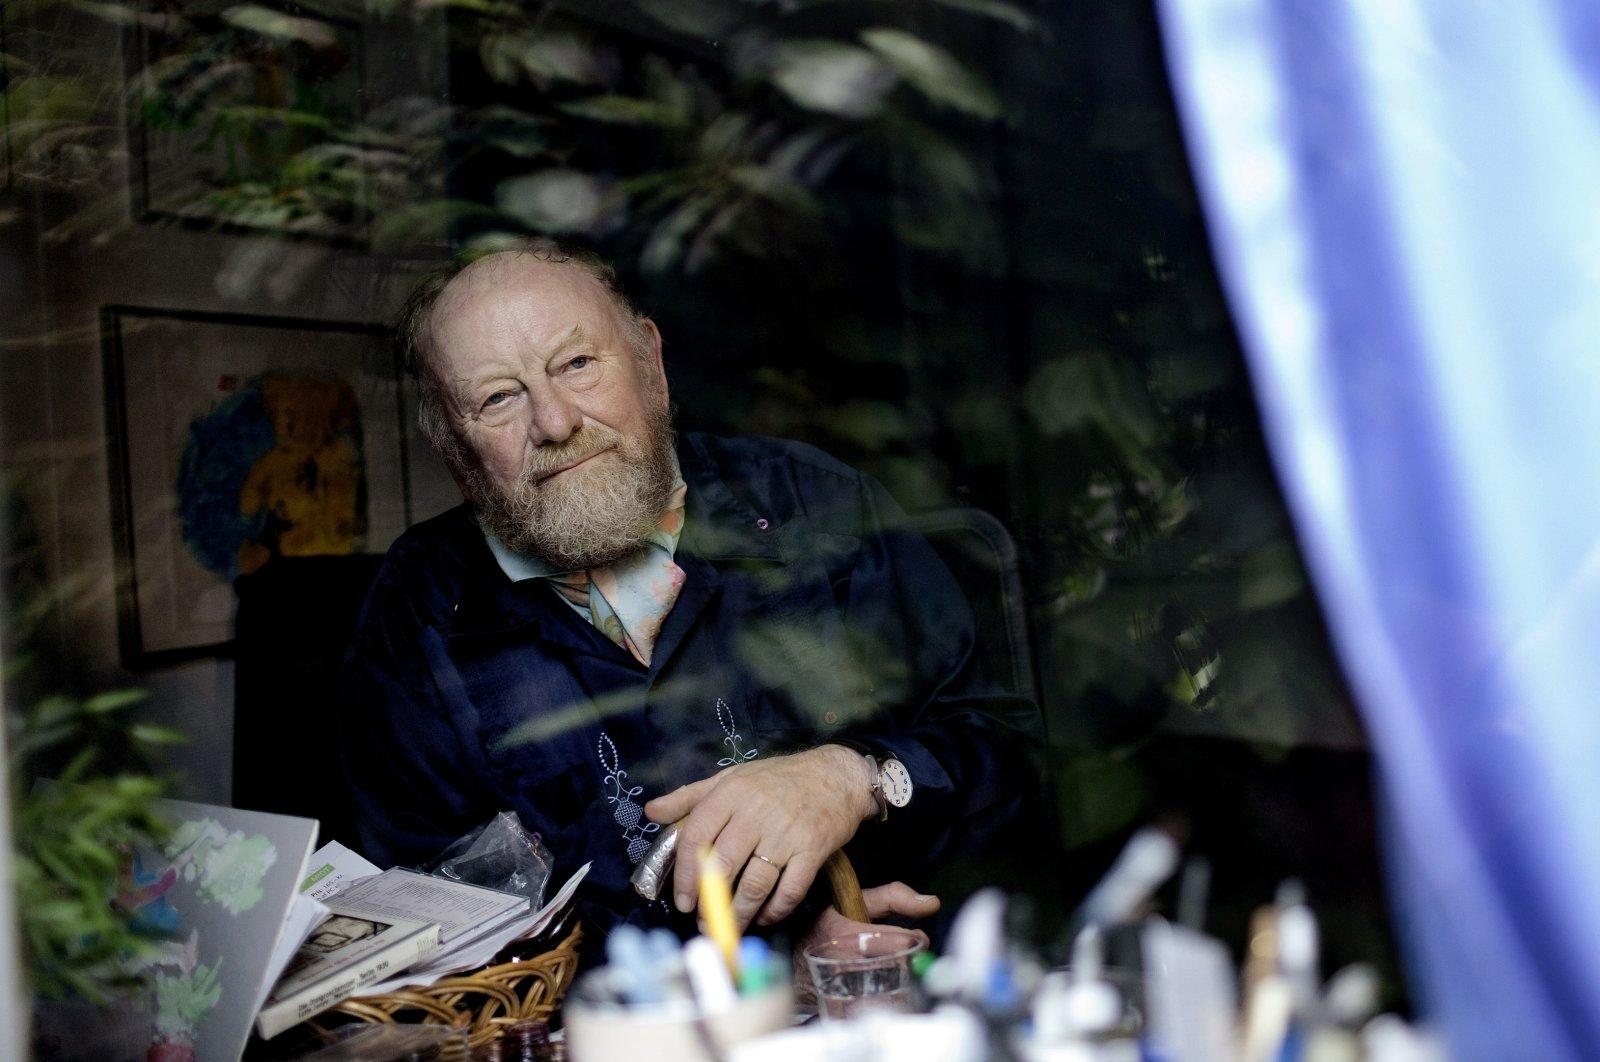 Danish cartoonist Kurt Westergaard is seen at his home near Aarhus, Denmark, June 6, 2010. (AP Photo)